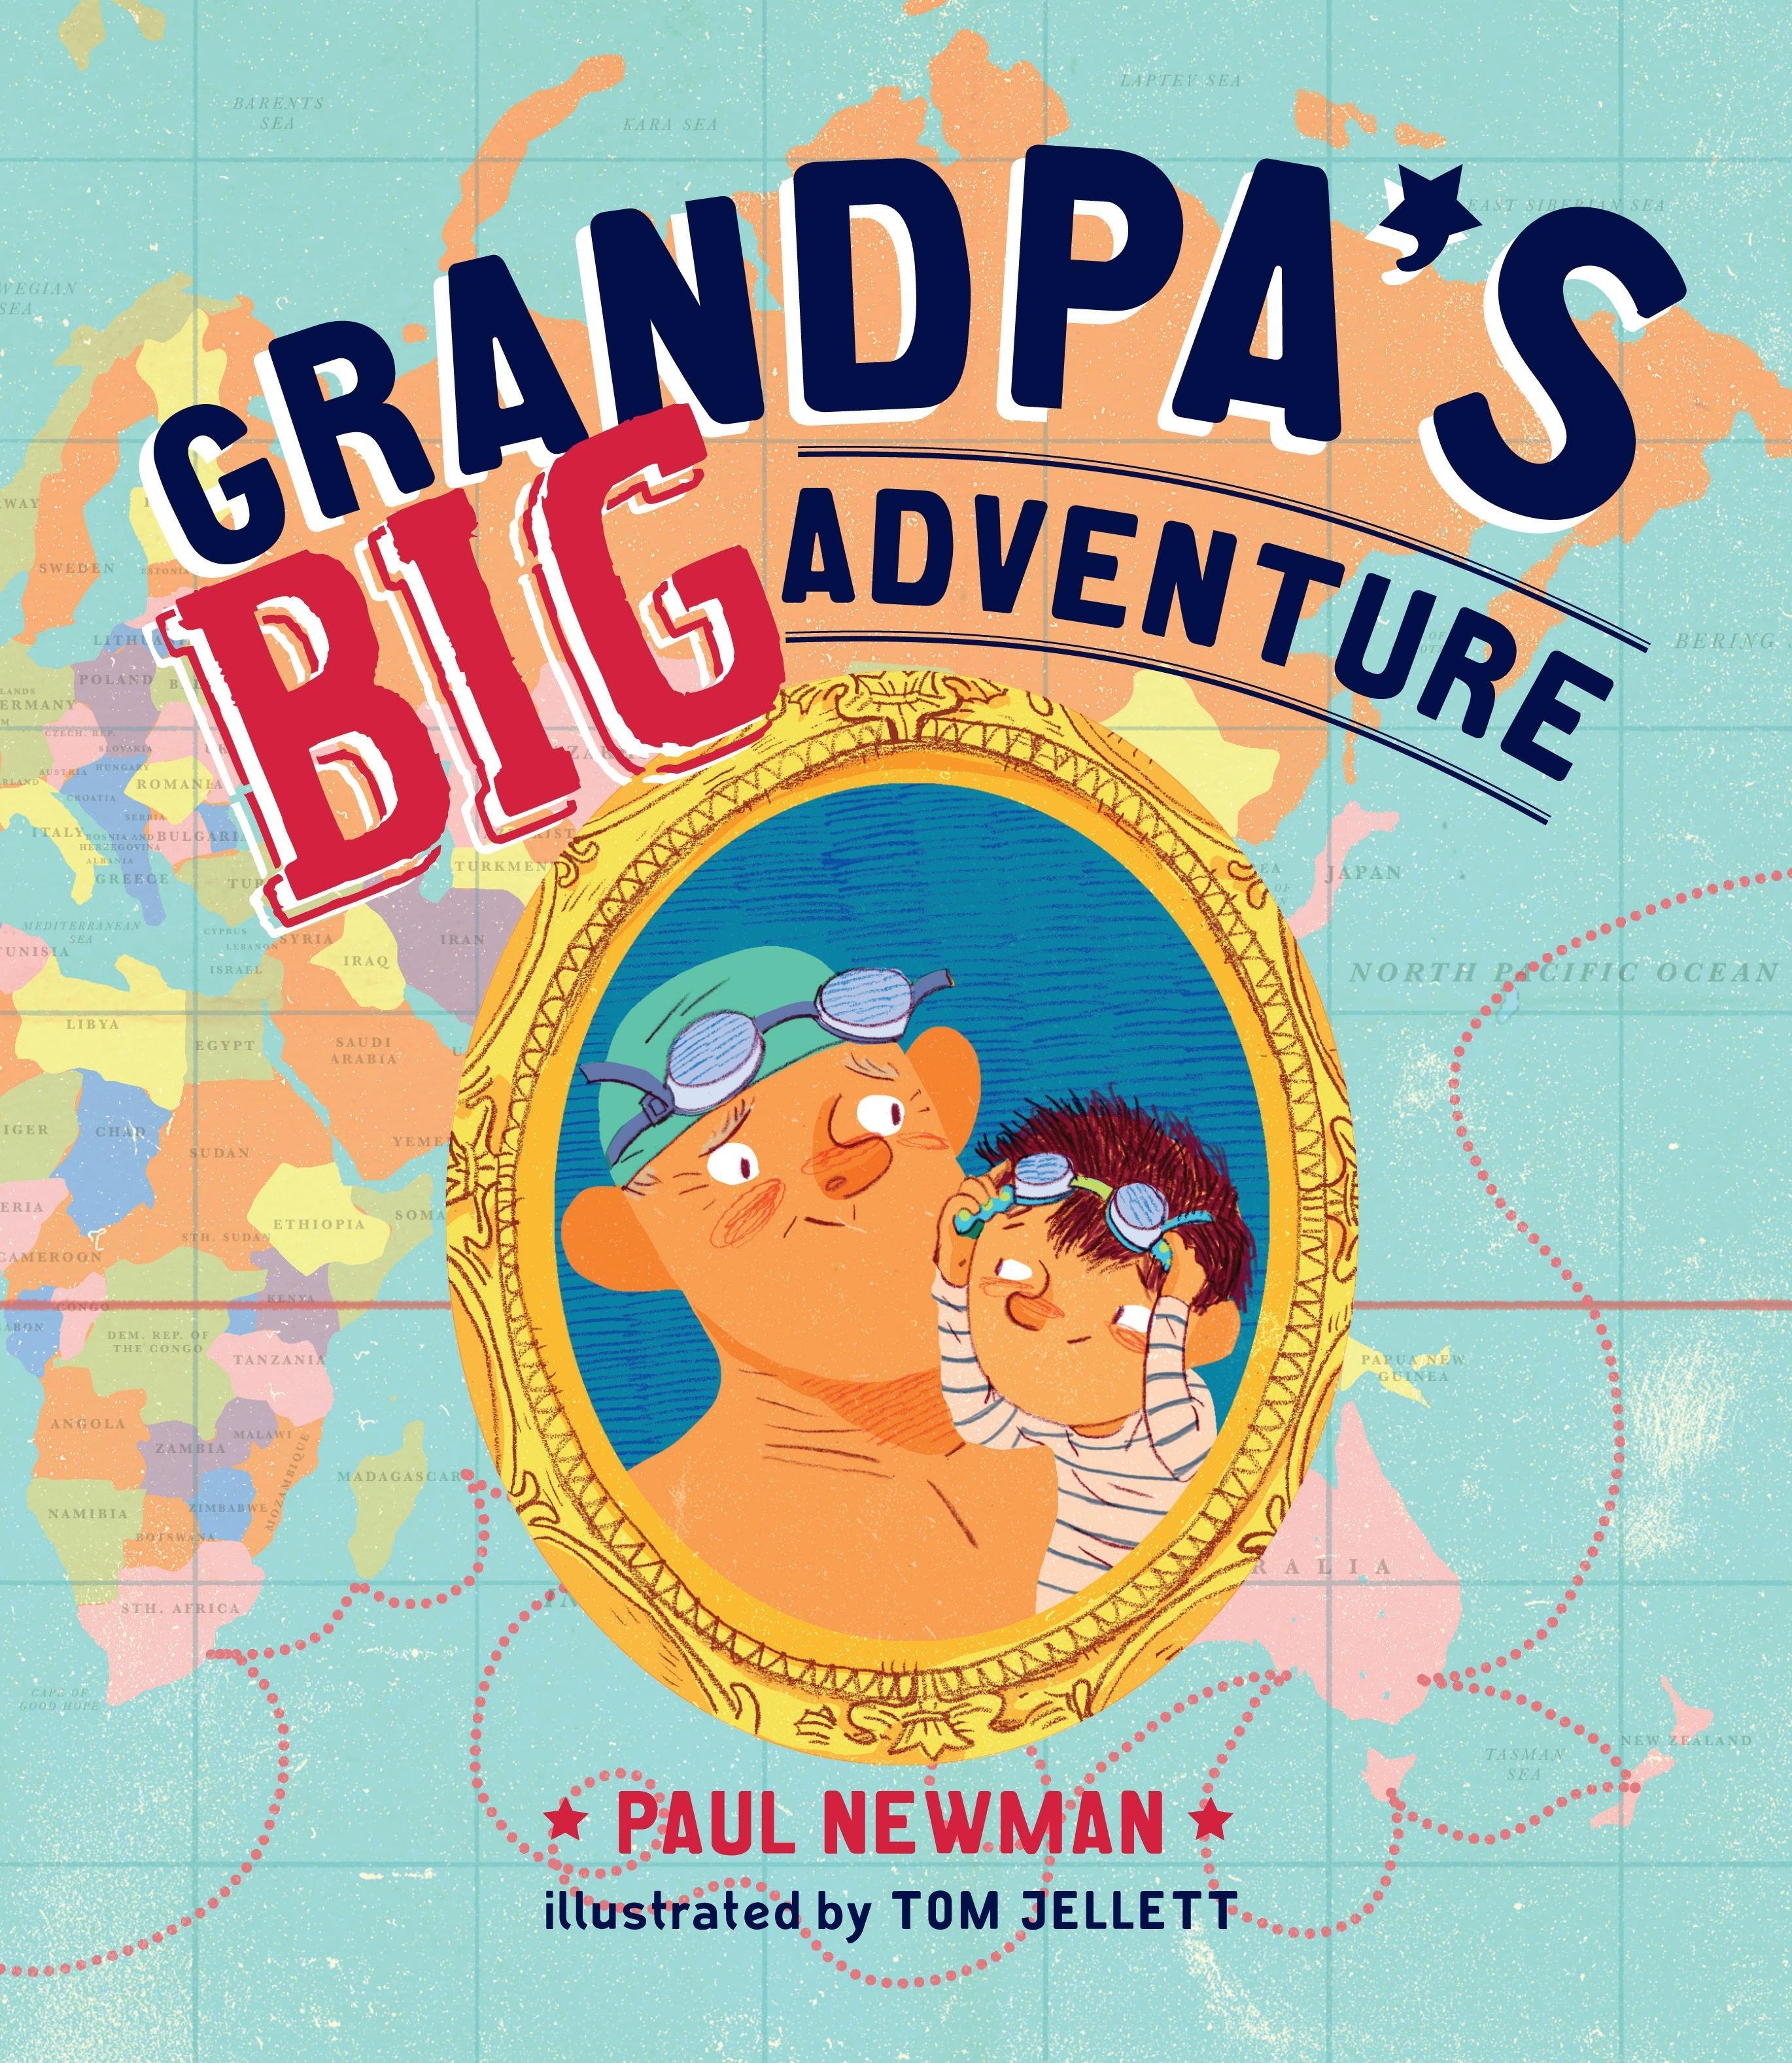 Grandpa'sBigAdventure